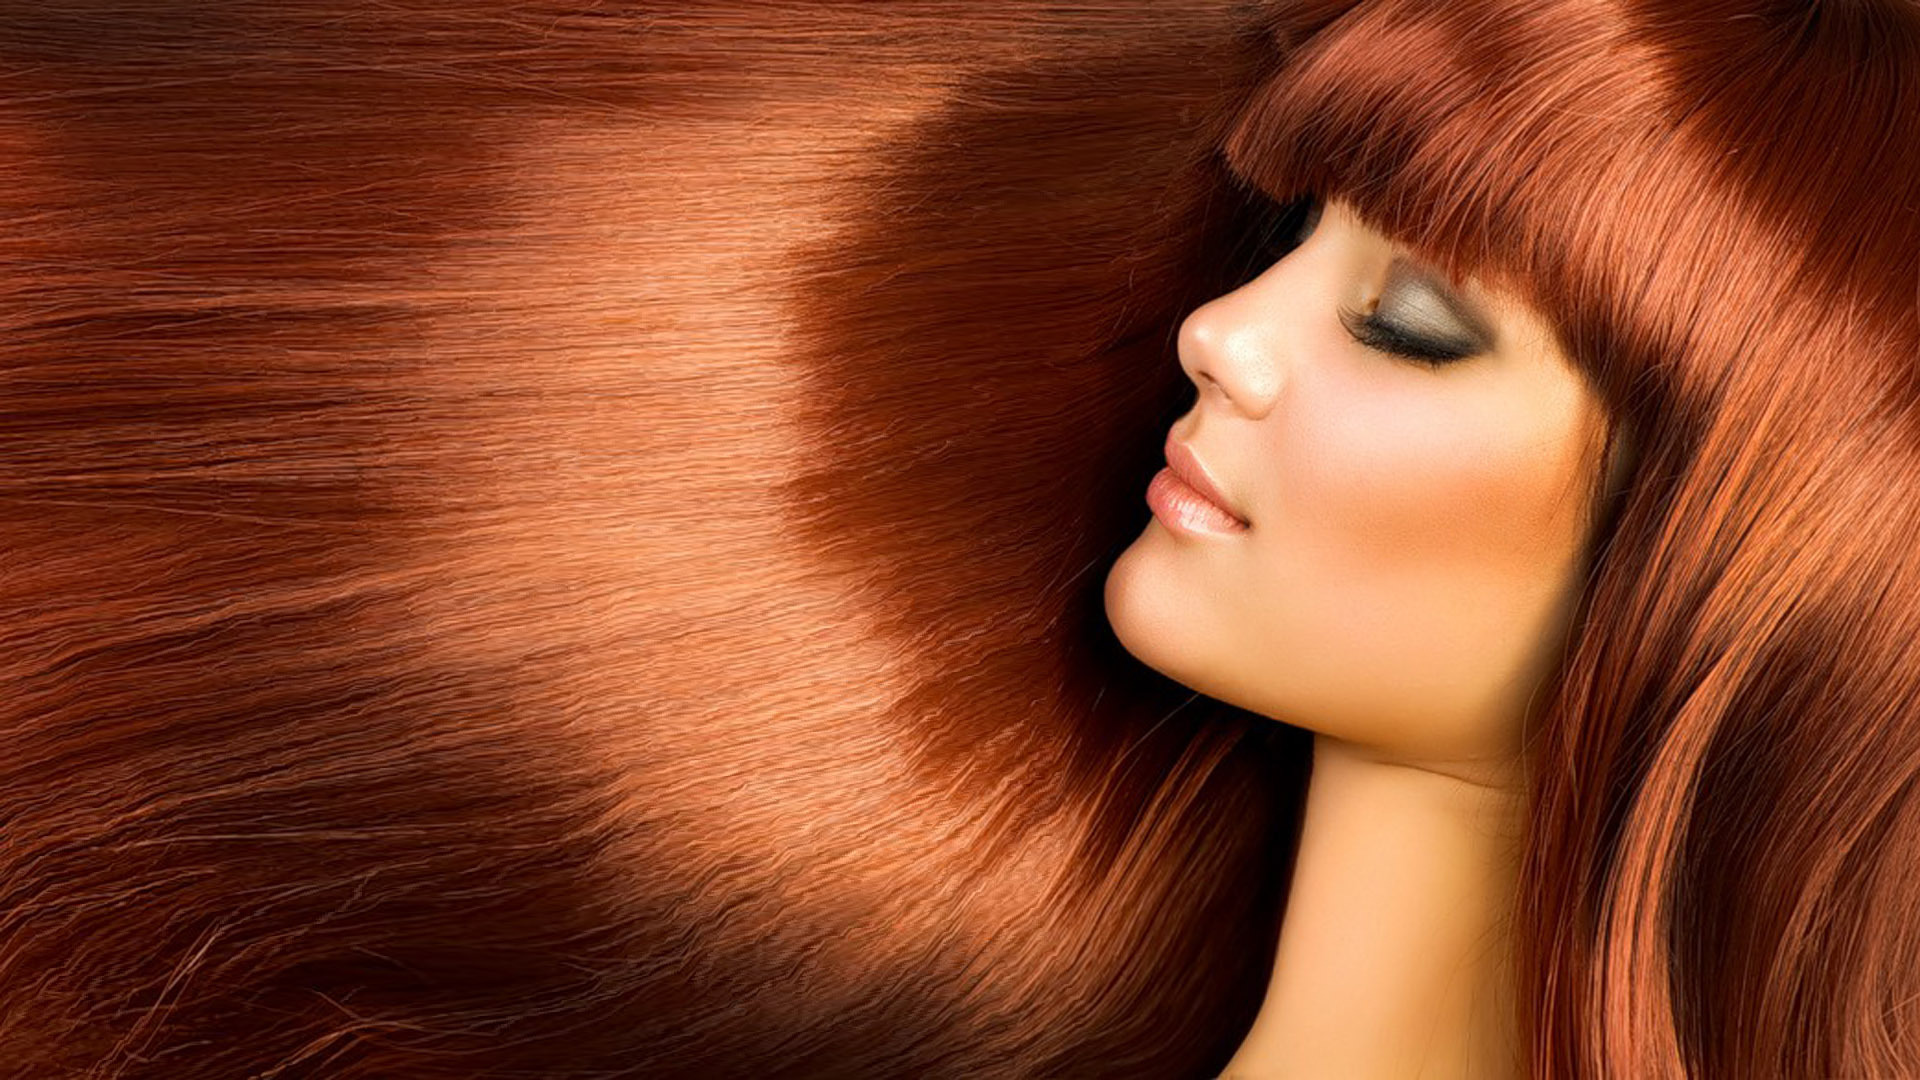 Hair salon girl sexual arousal